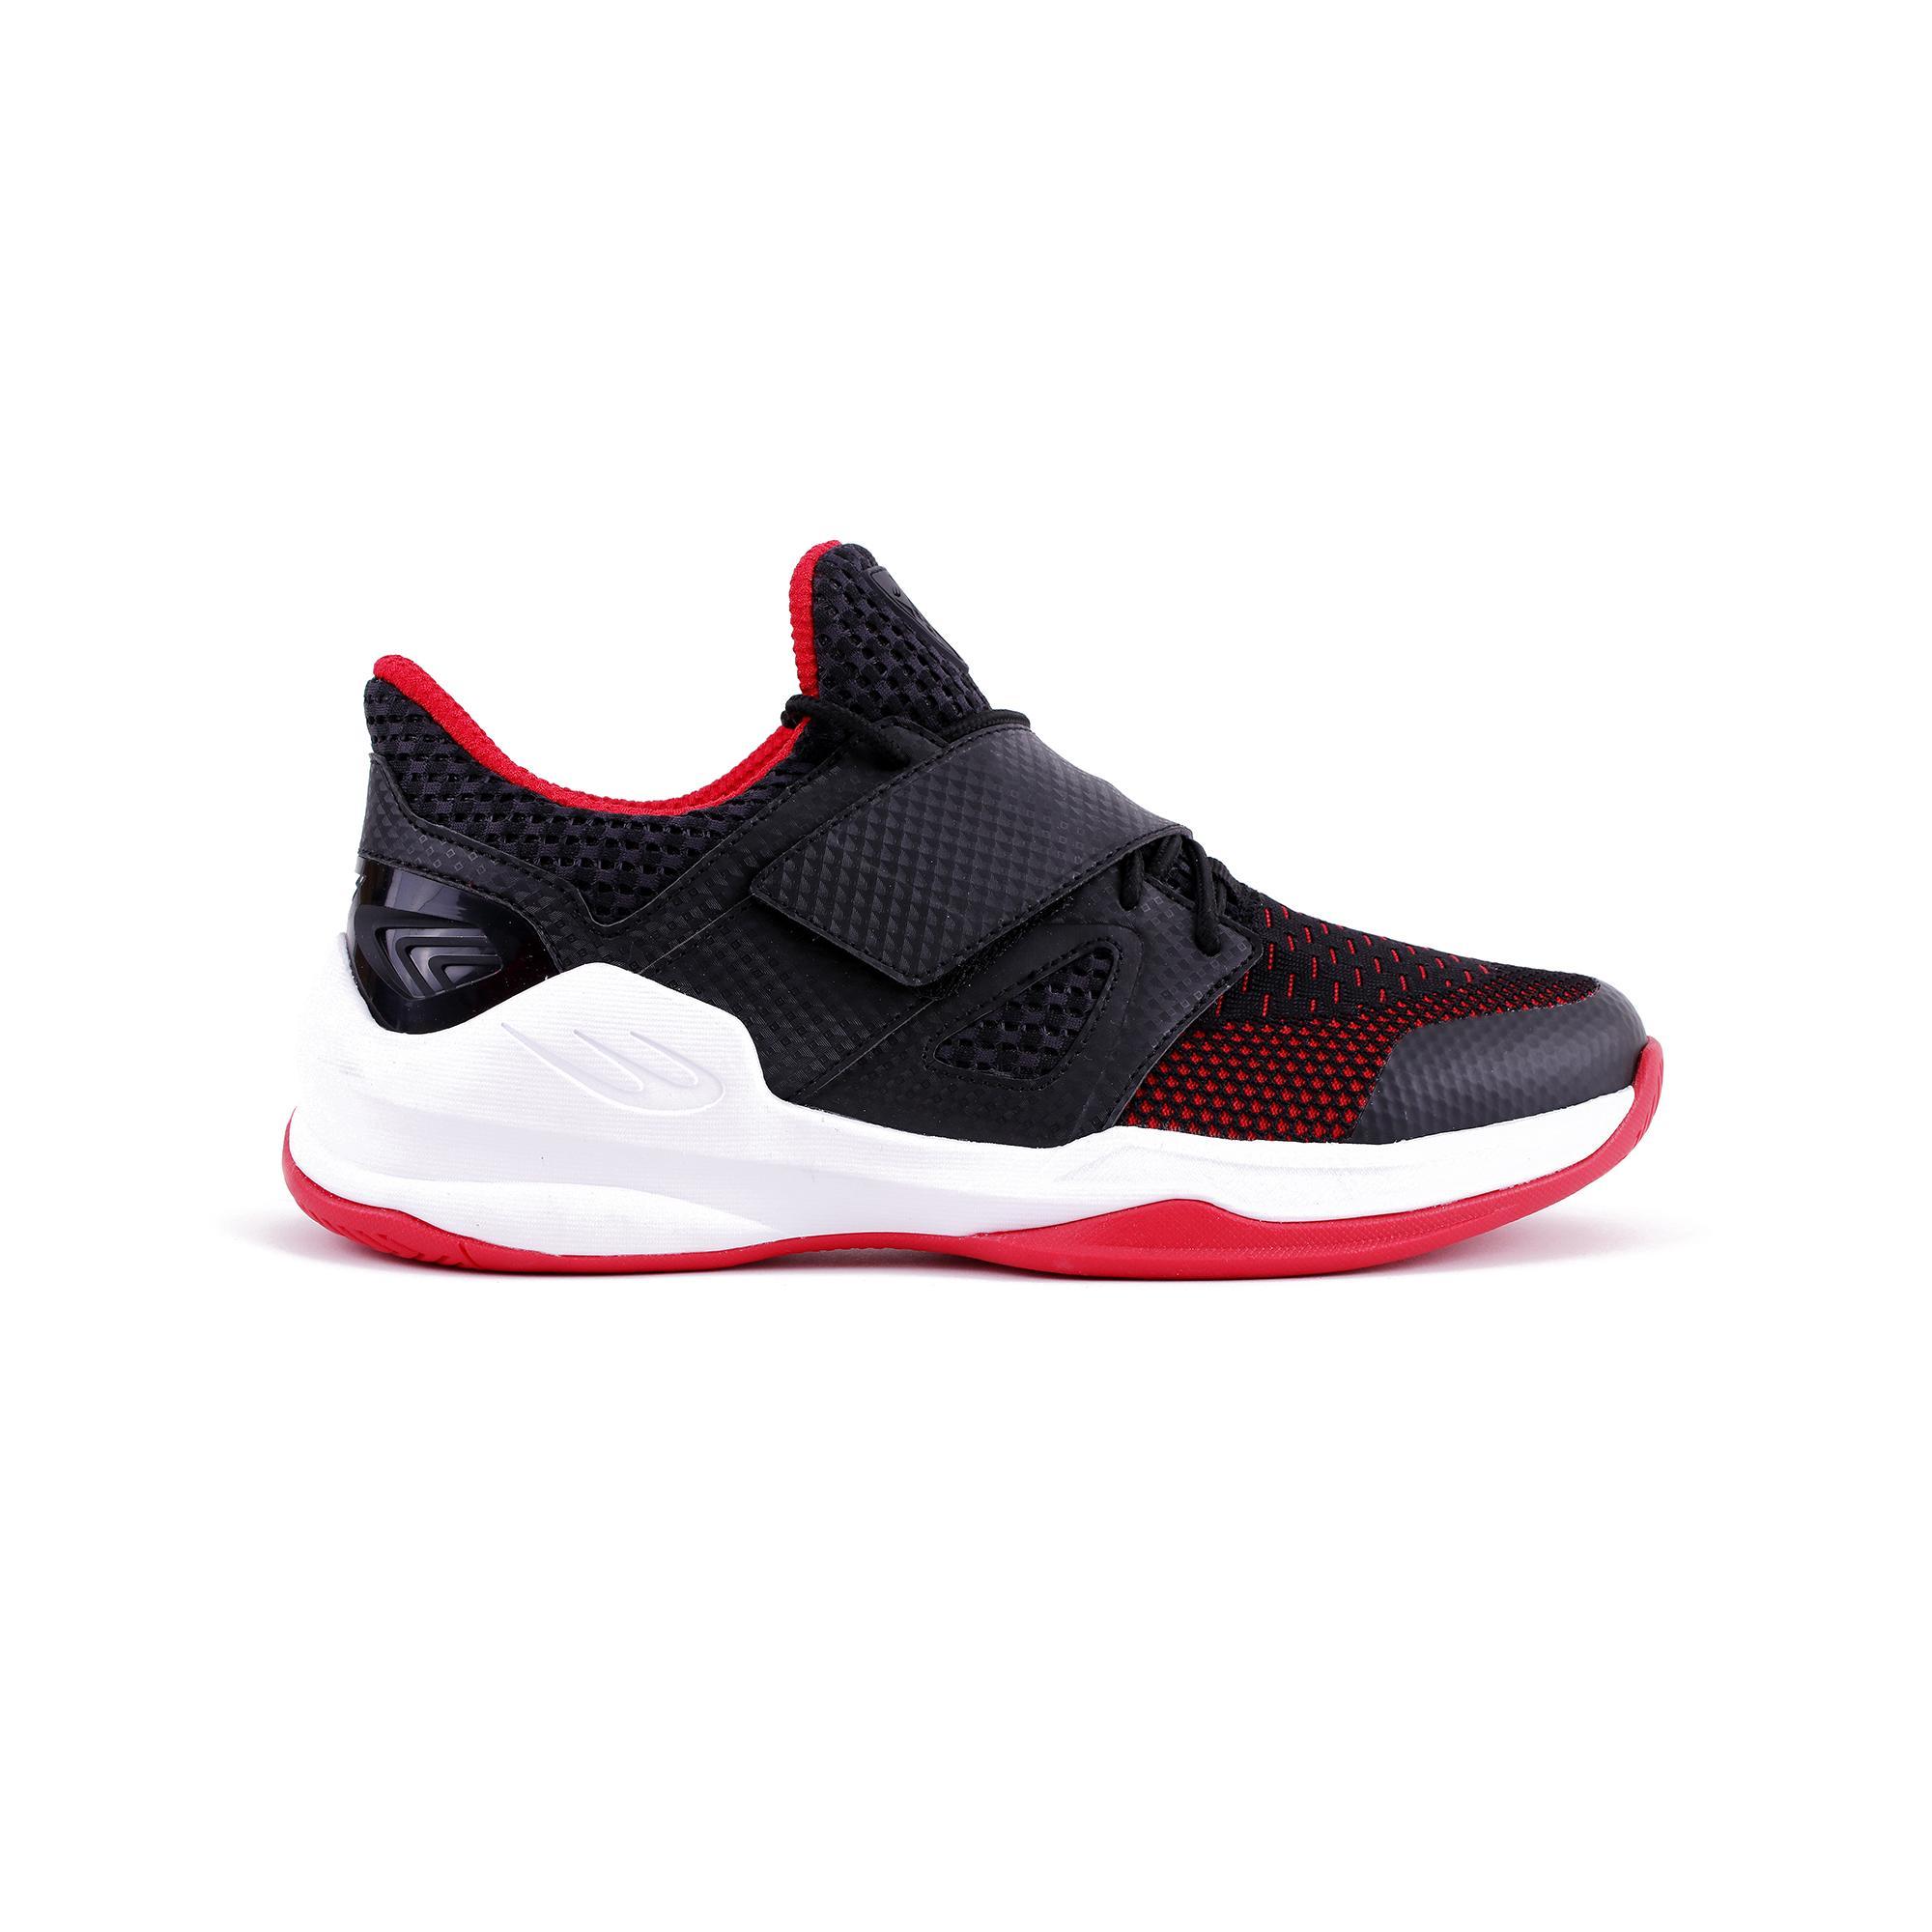 World Balance Philippines Price List Jam Tangan Qampampq Vr 42 Rubber Oranye Original Basketball Shoes